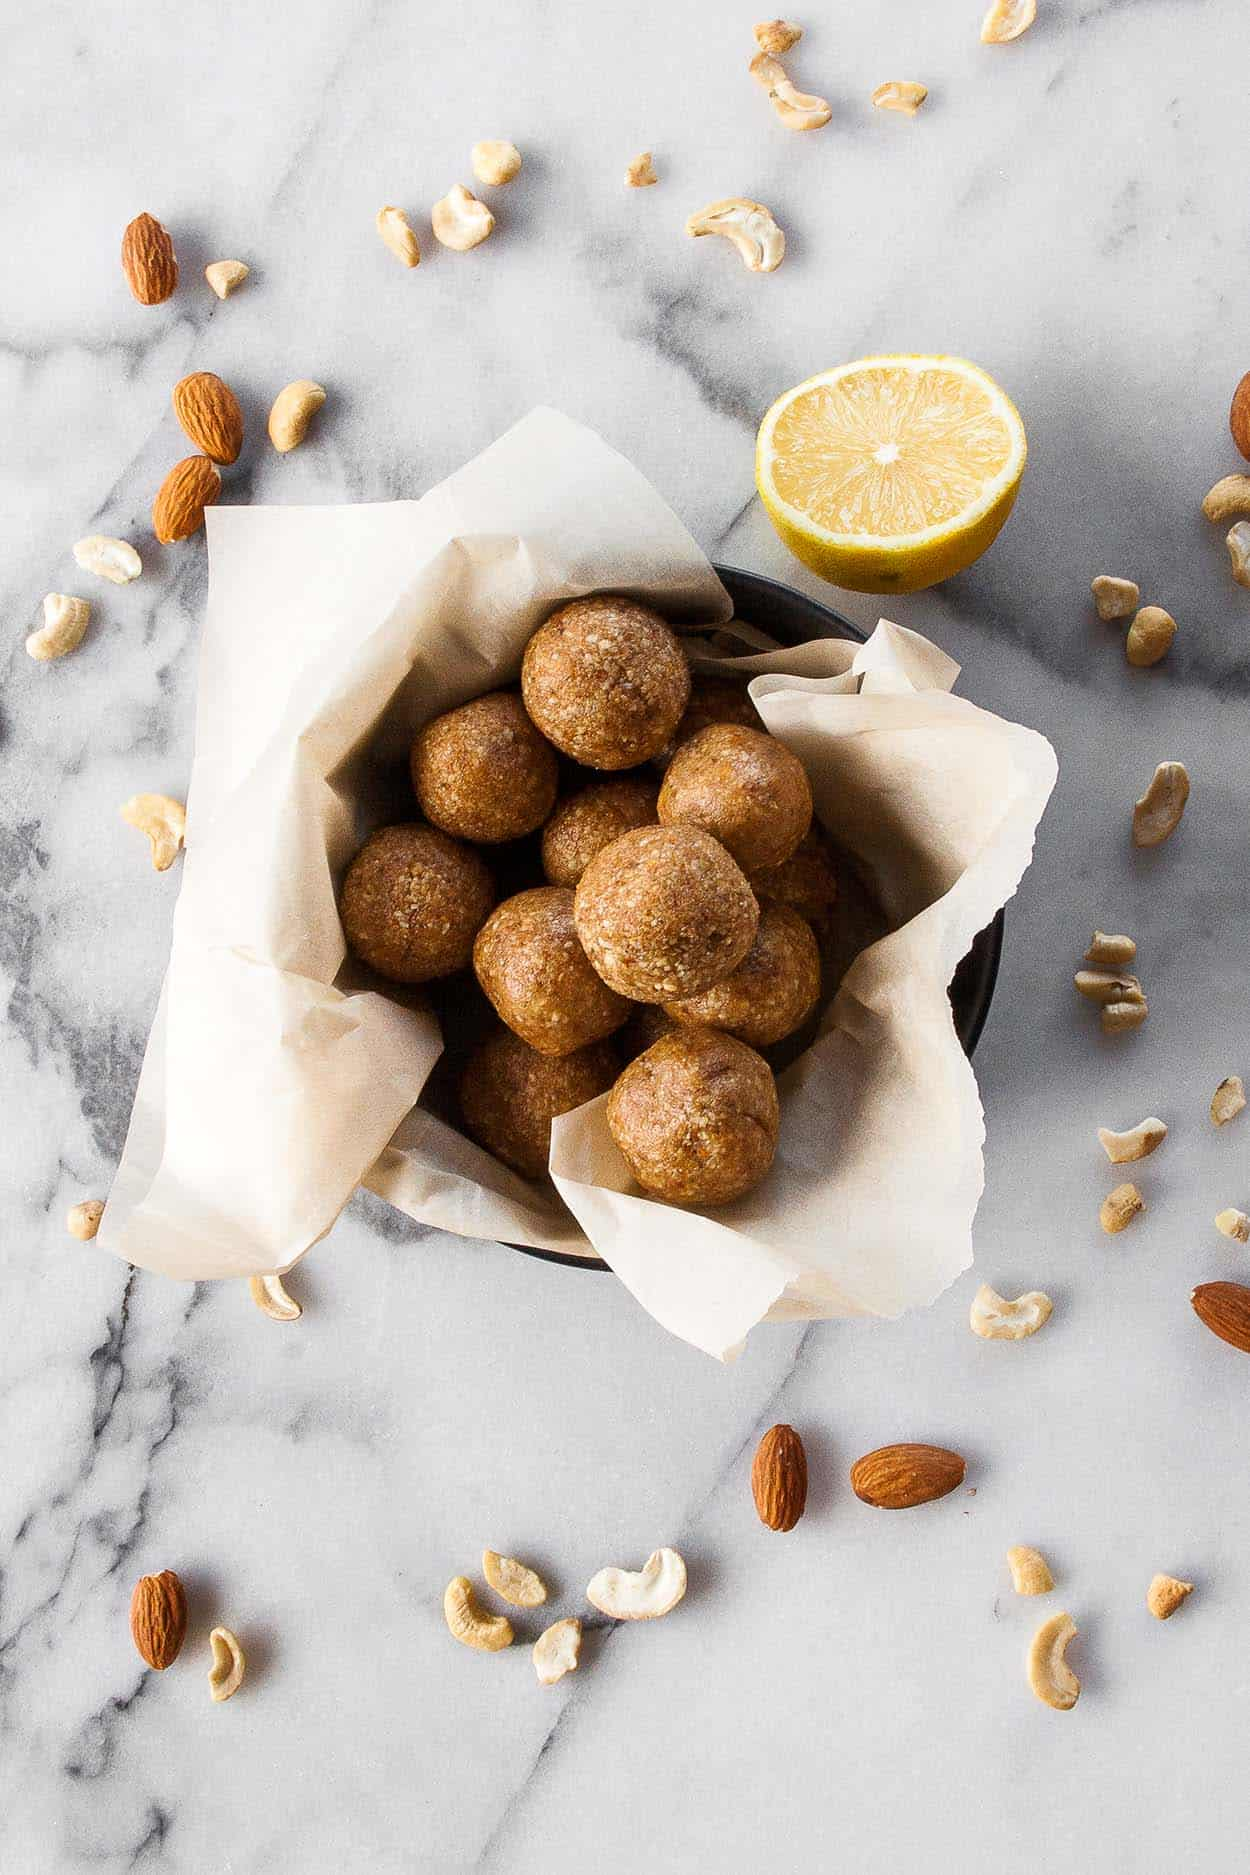 Homemade Lemon Larabar Bites | energy bites, energy balls, copycat, gluten free, paleo, recipe, easy, food processor, Whole30 | hungrybynature.com